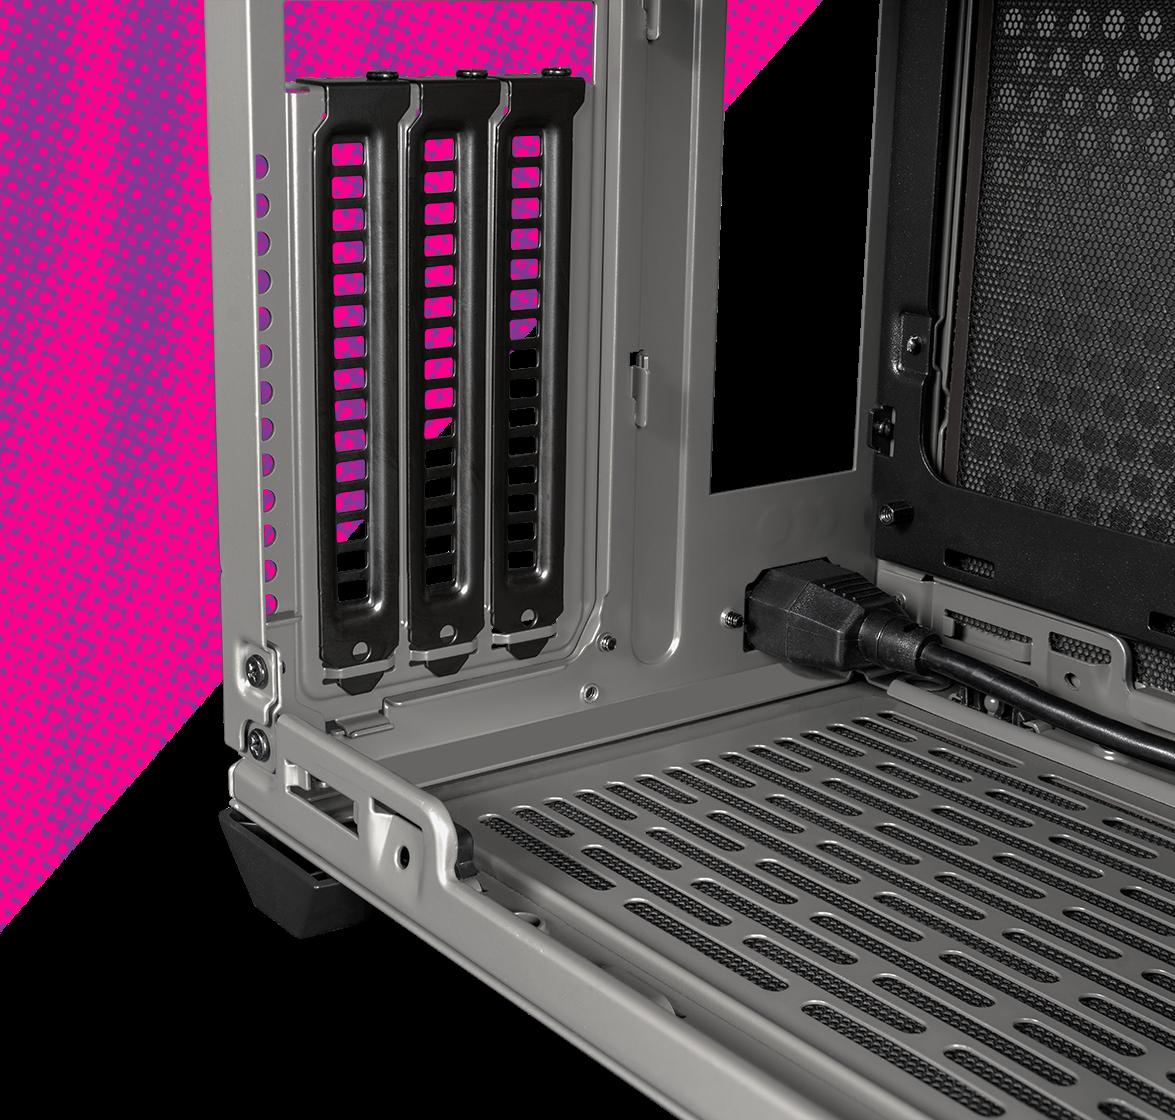 Triple-Slot GPU Support